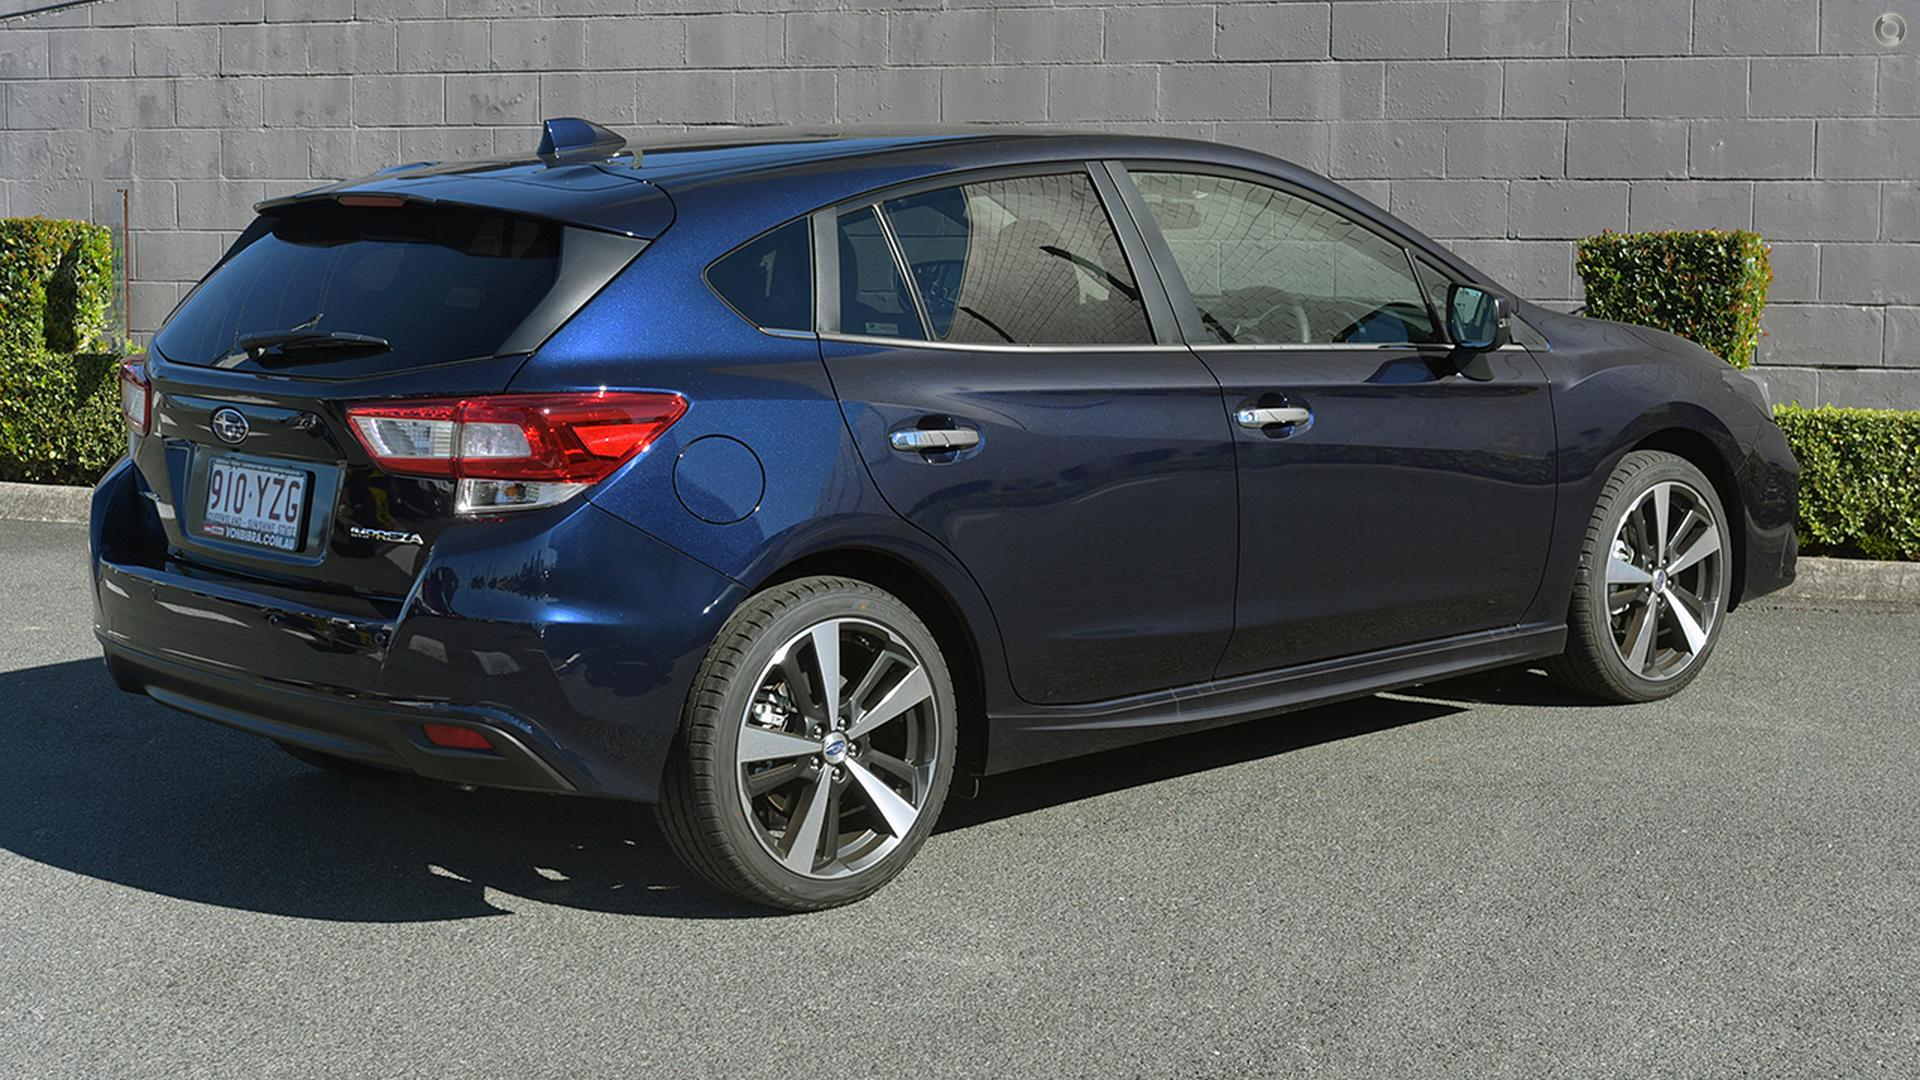 2019 Subaru Impreza 2.0i-S G5